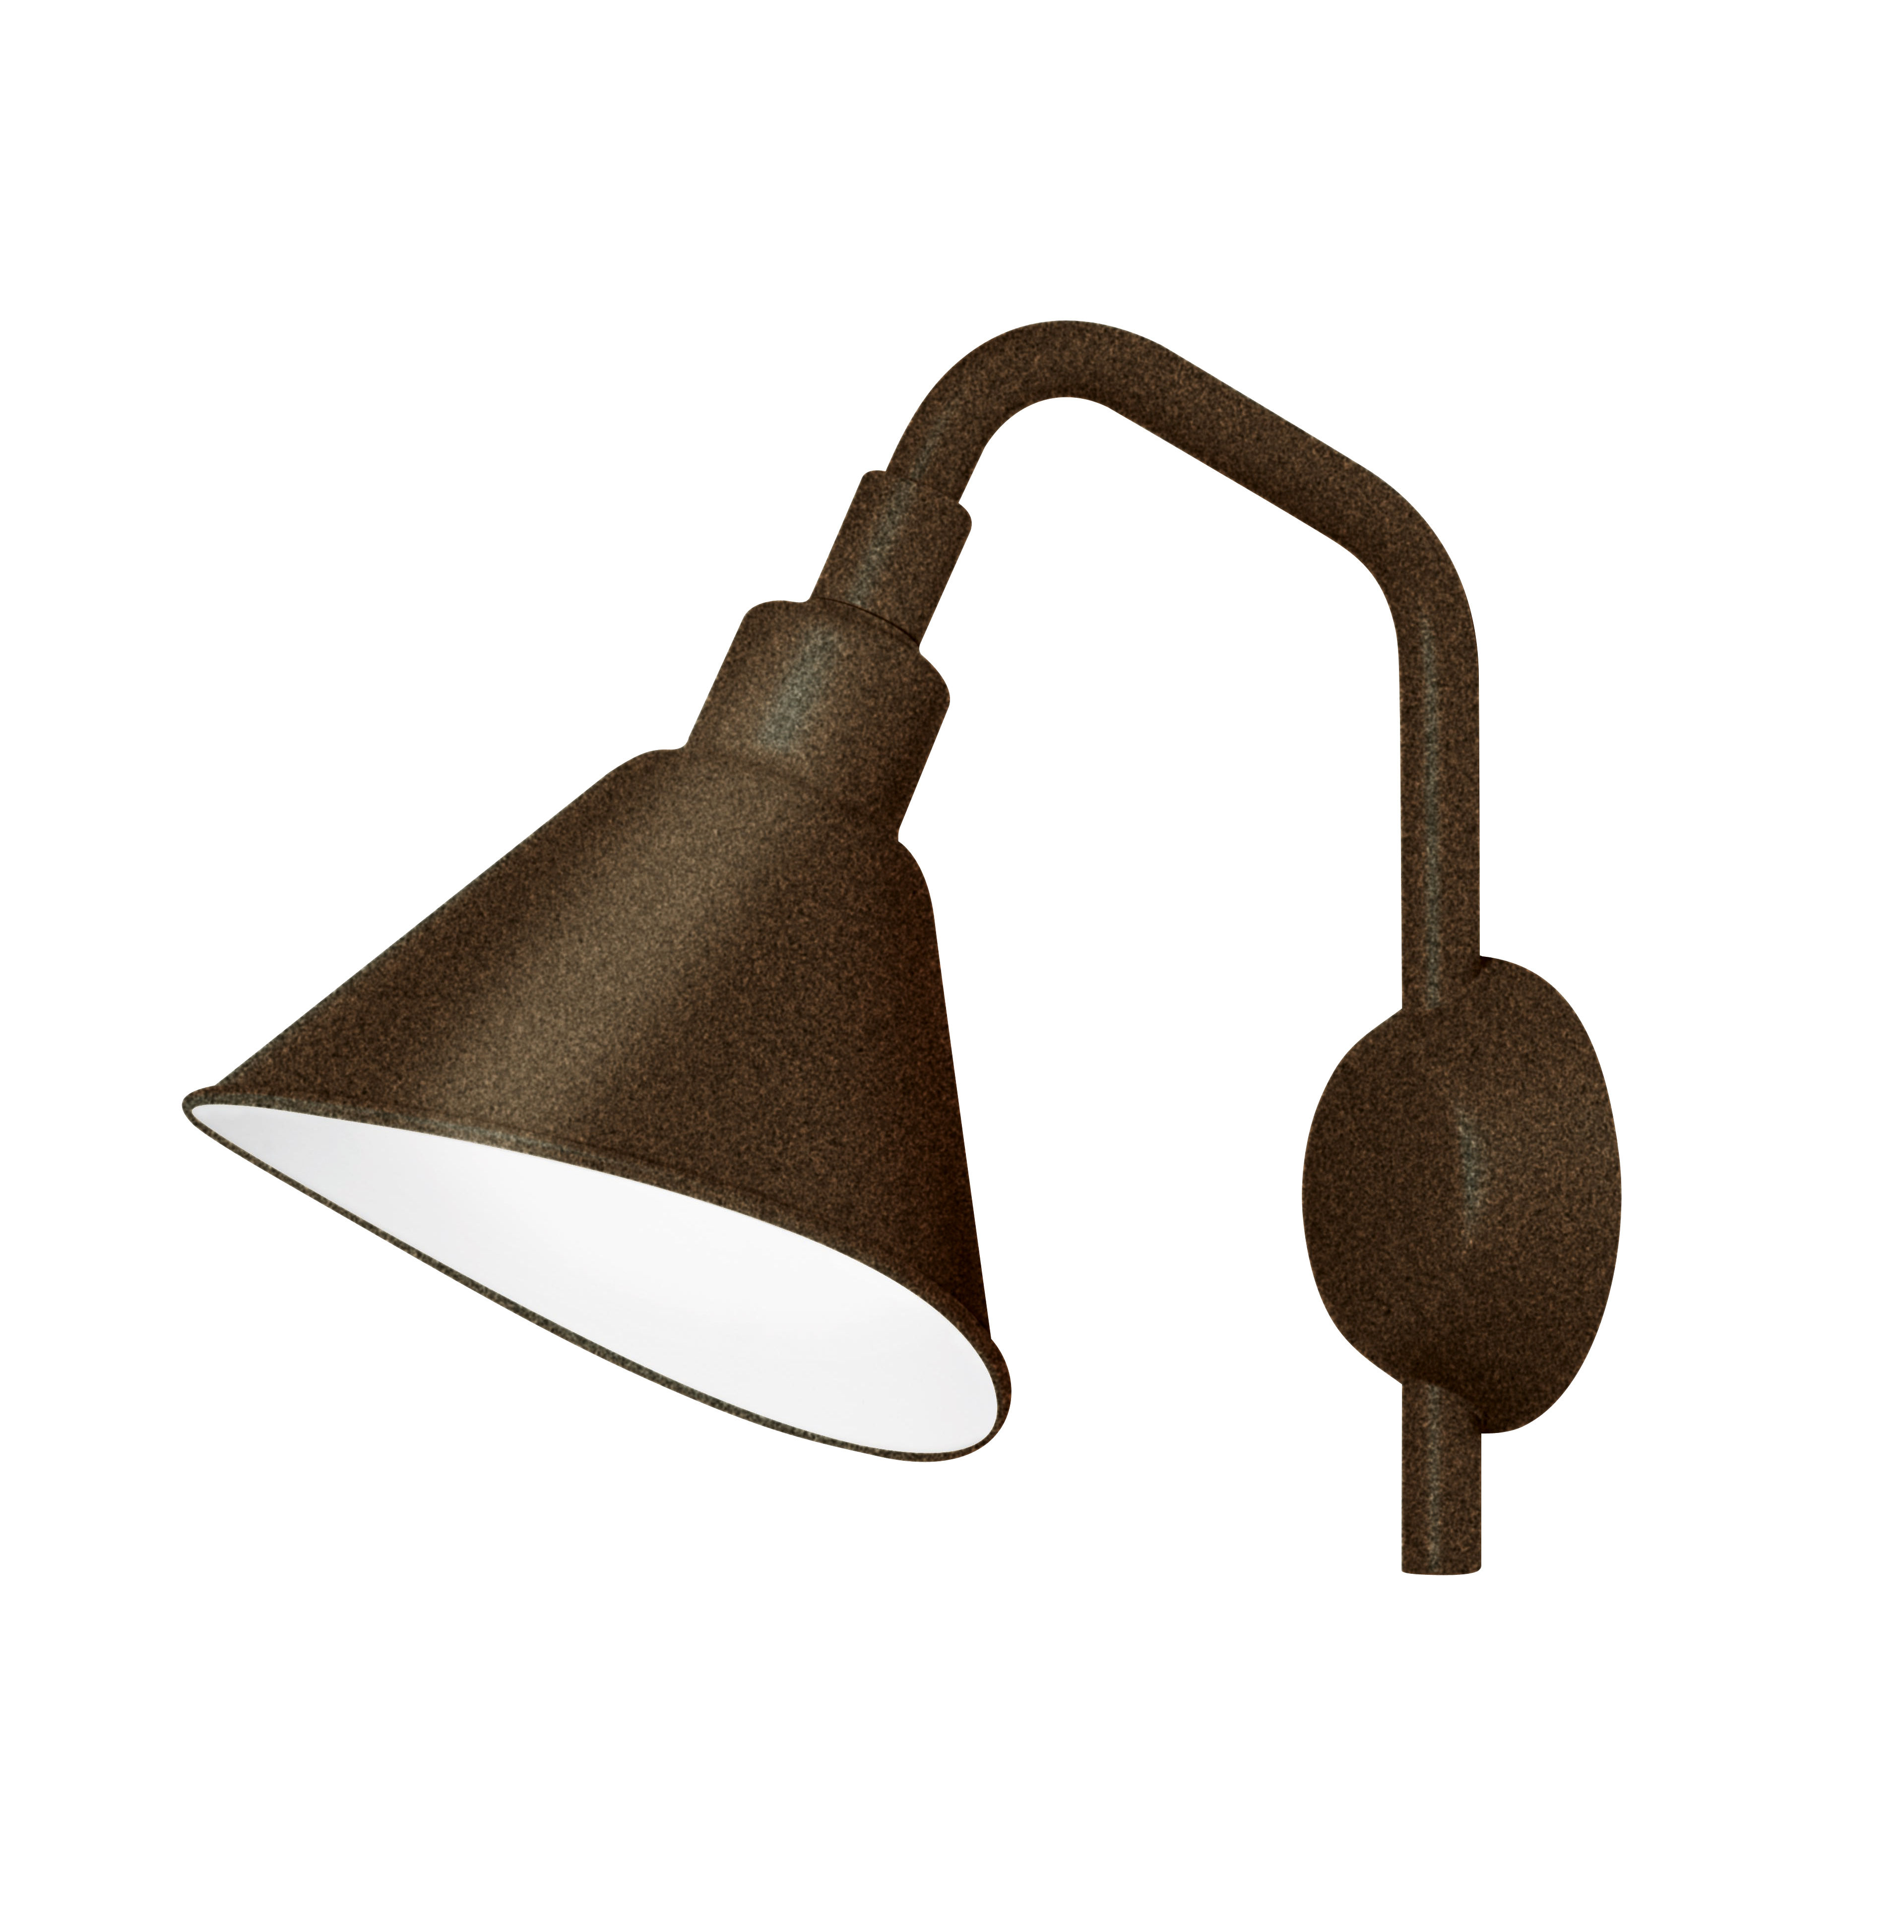 Luminaire - Appliques - Applique Smash Small / Métal - L 25 x H 32 cm - Diesel with Foscarini - Rouille - Aluminium verni, Métal verni